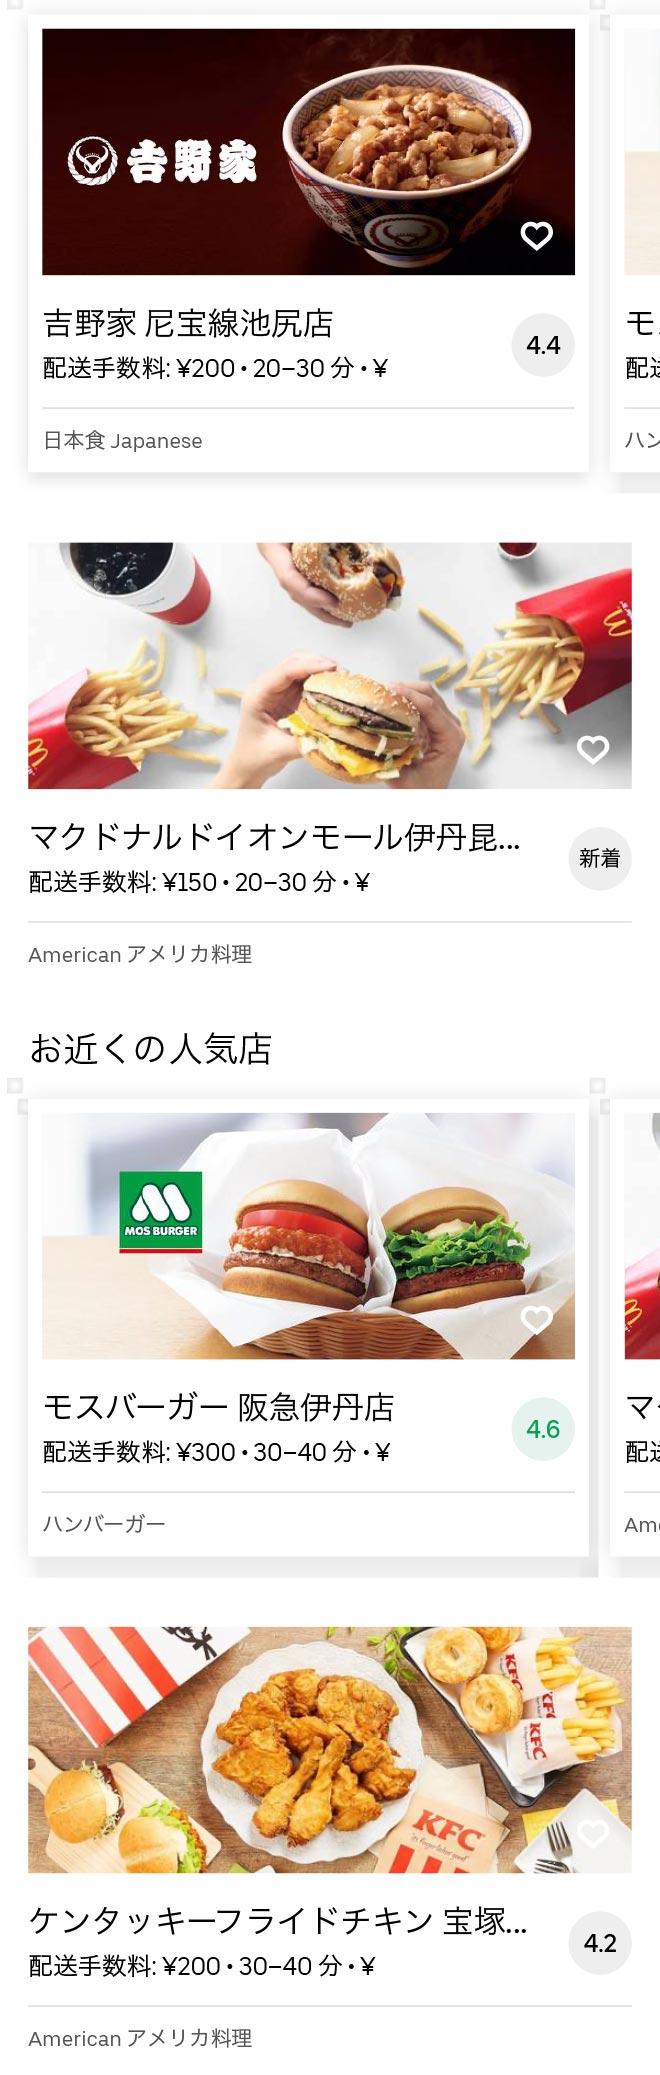 Itami sakuradai menu 2007 01